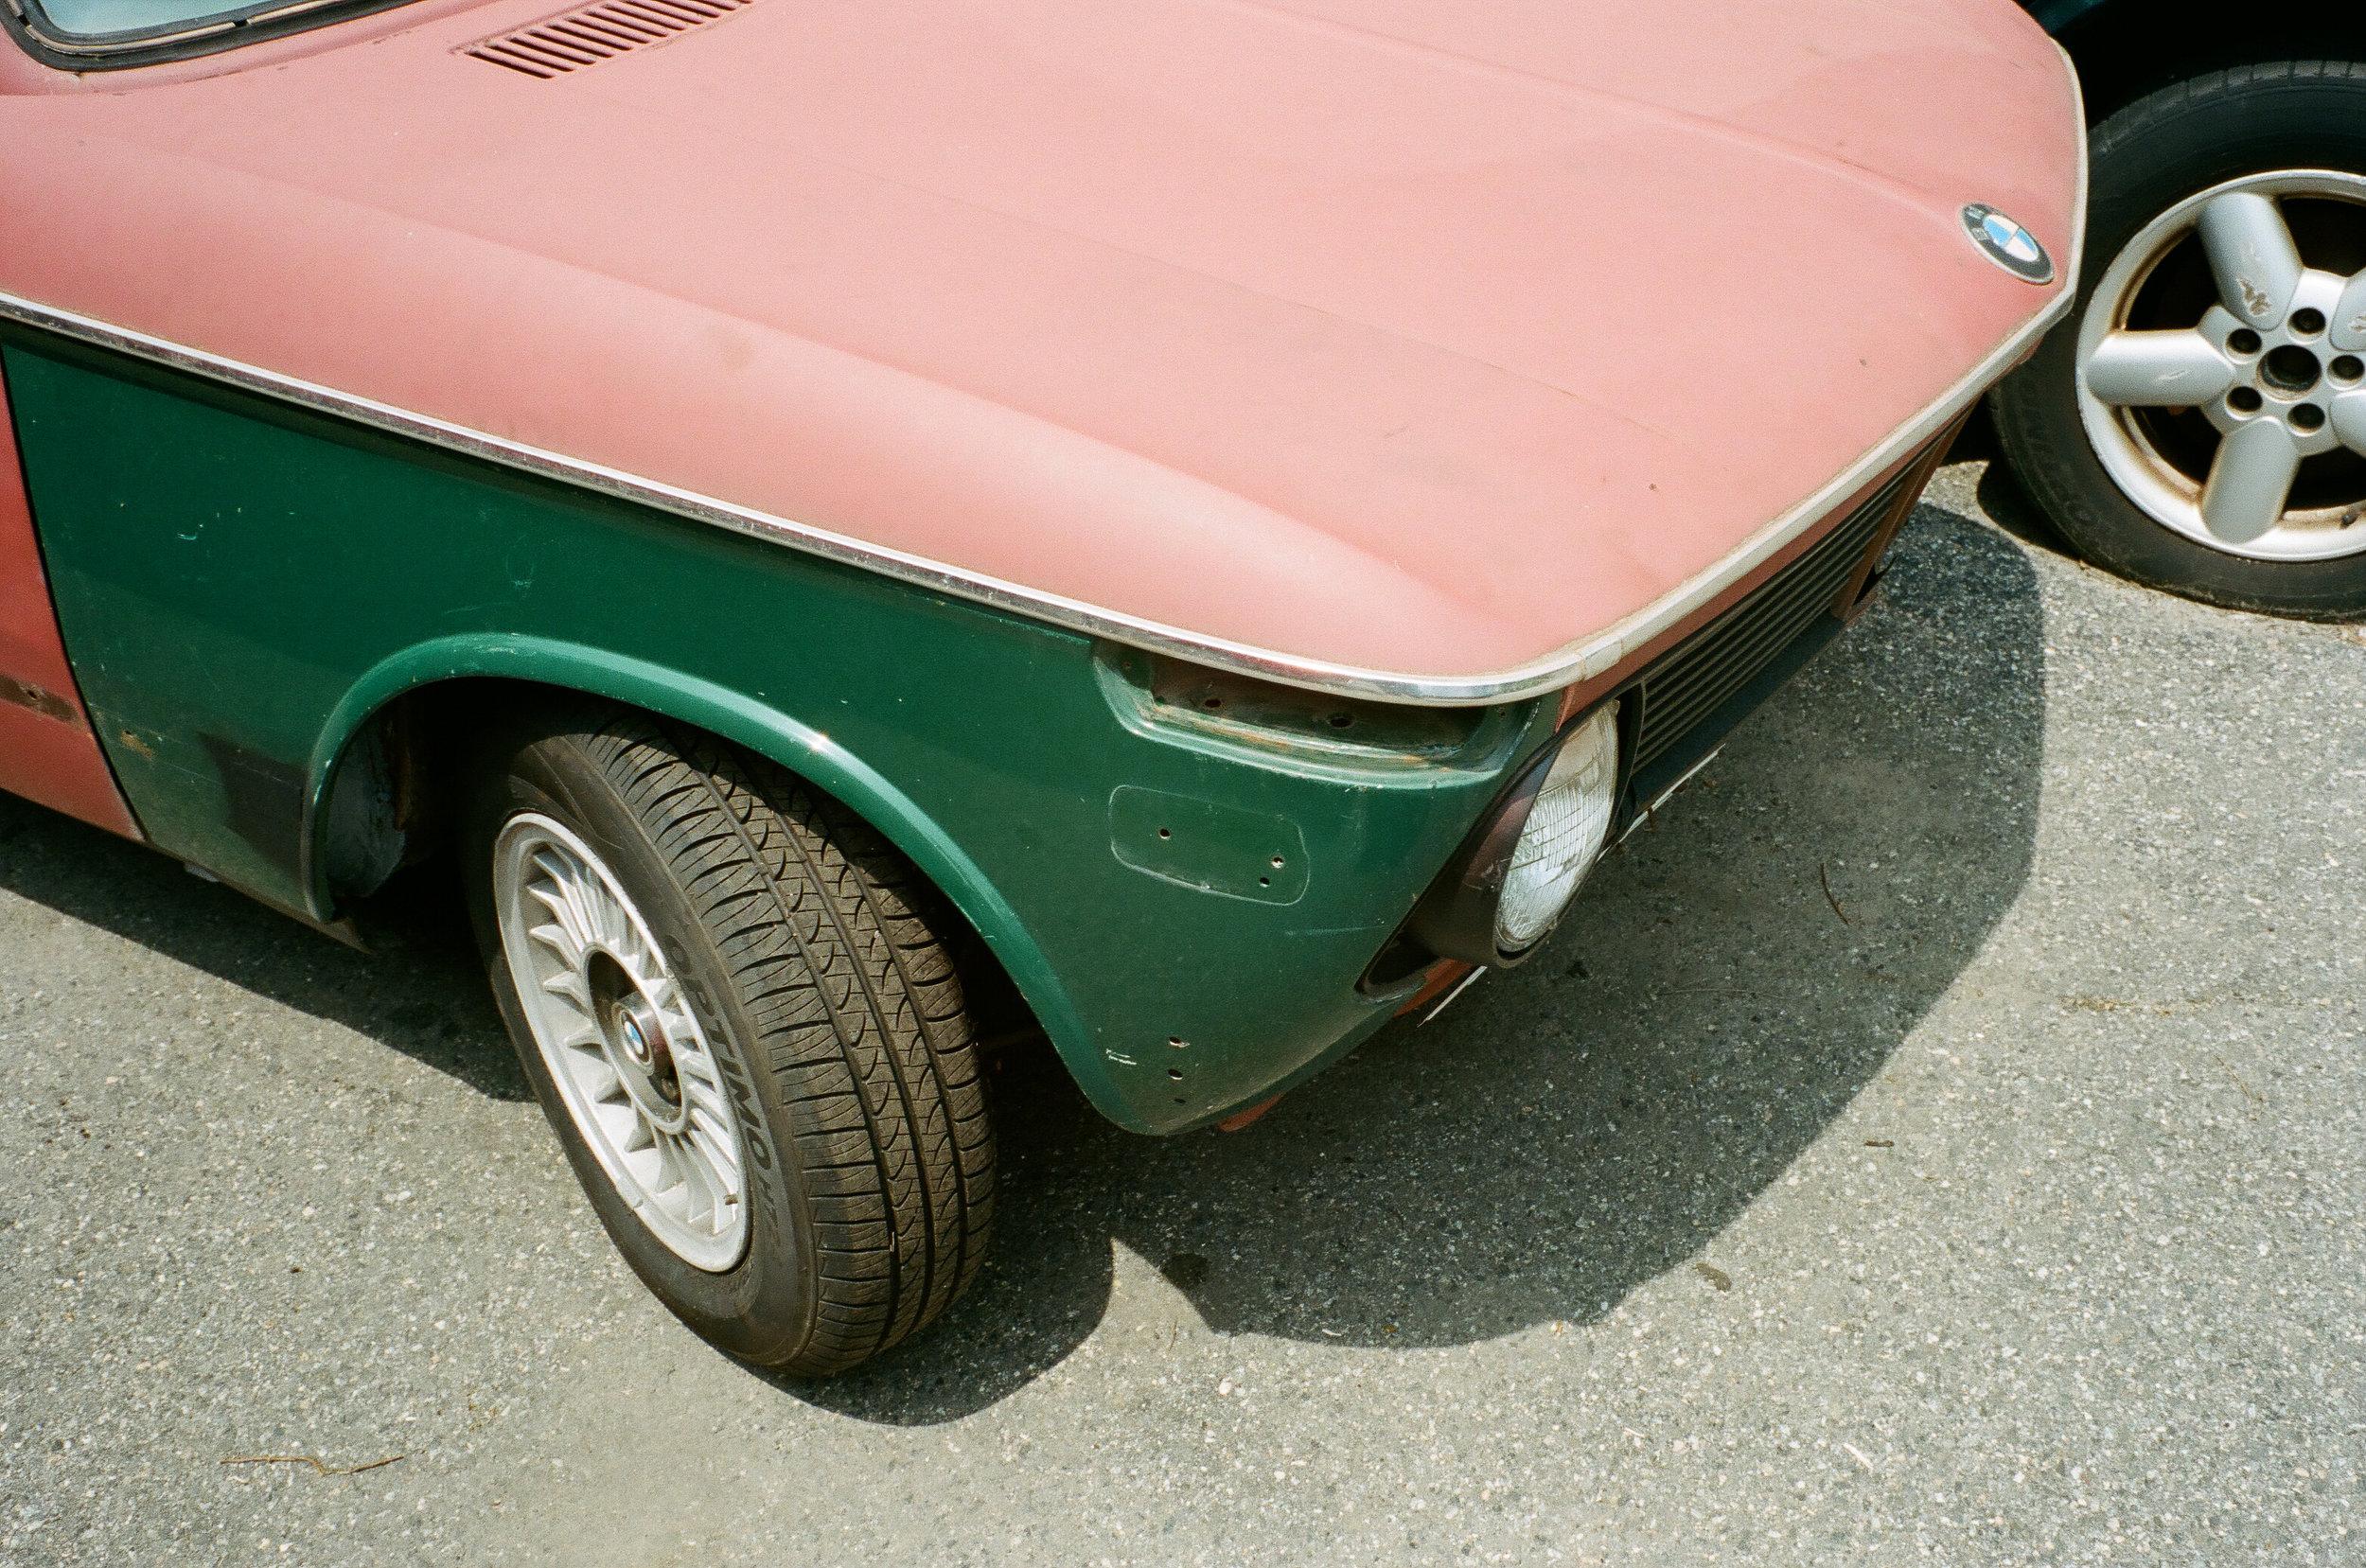 LeicaM6062019-1006.jpg